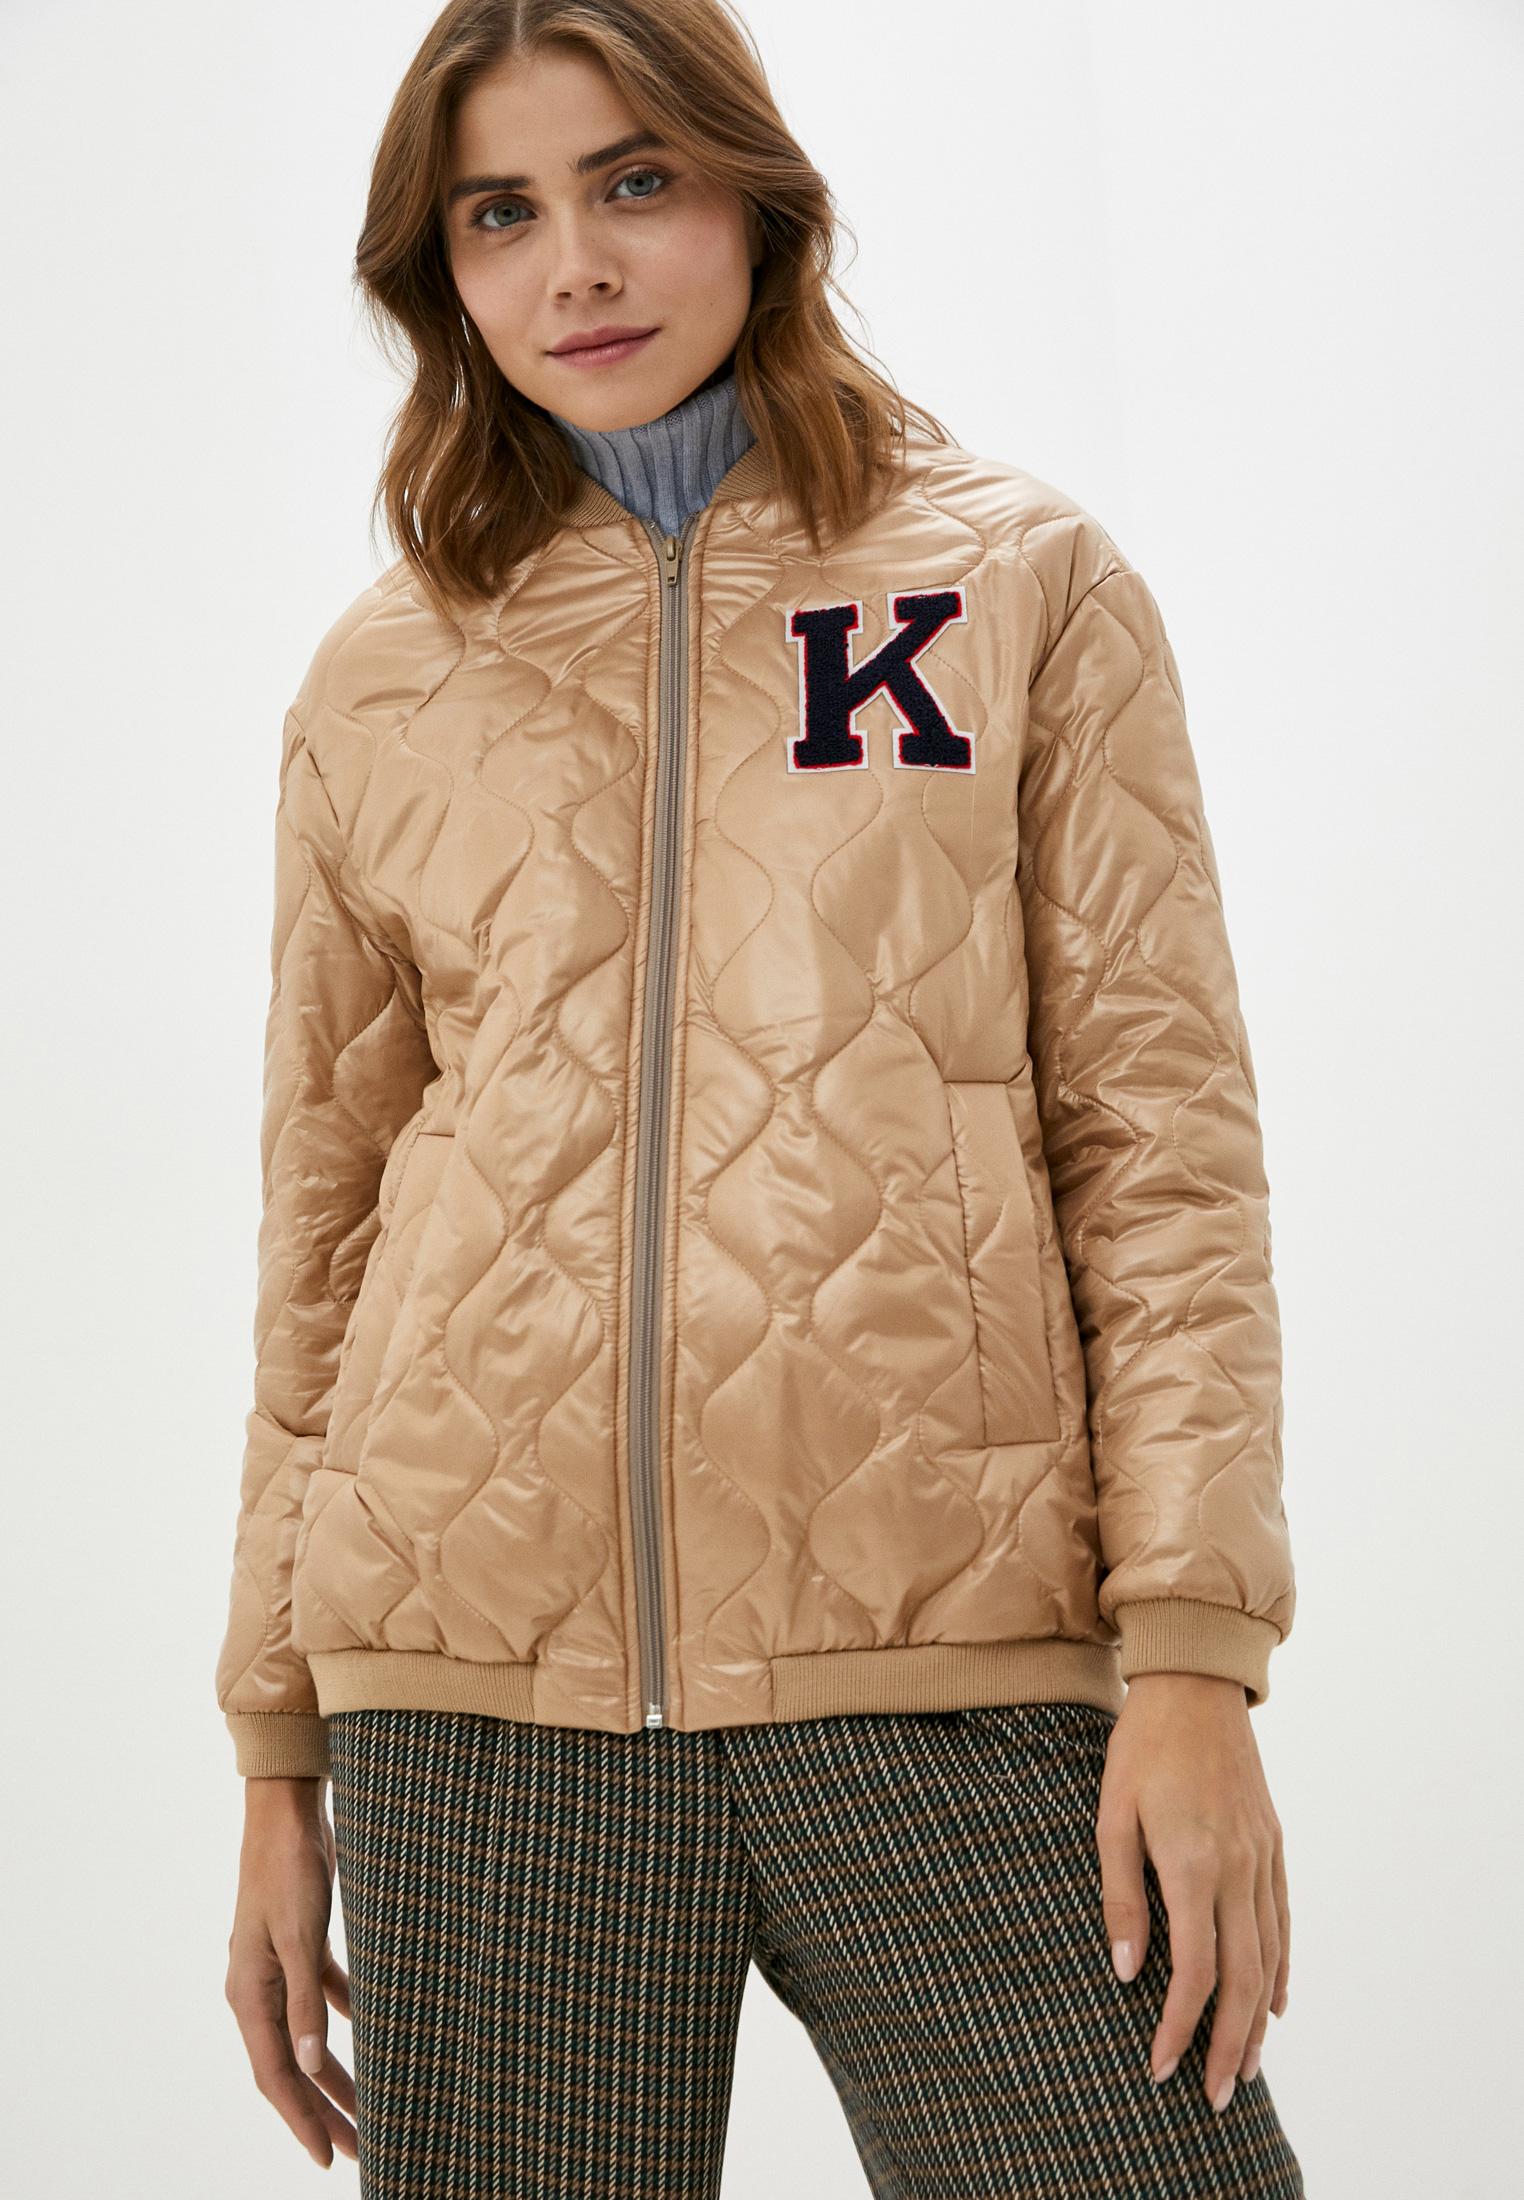 Утепленная куртка Kontatto Куртка утепленная Kontatto